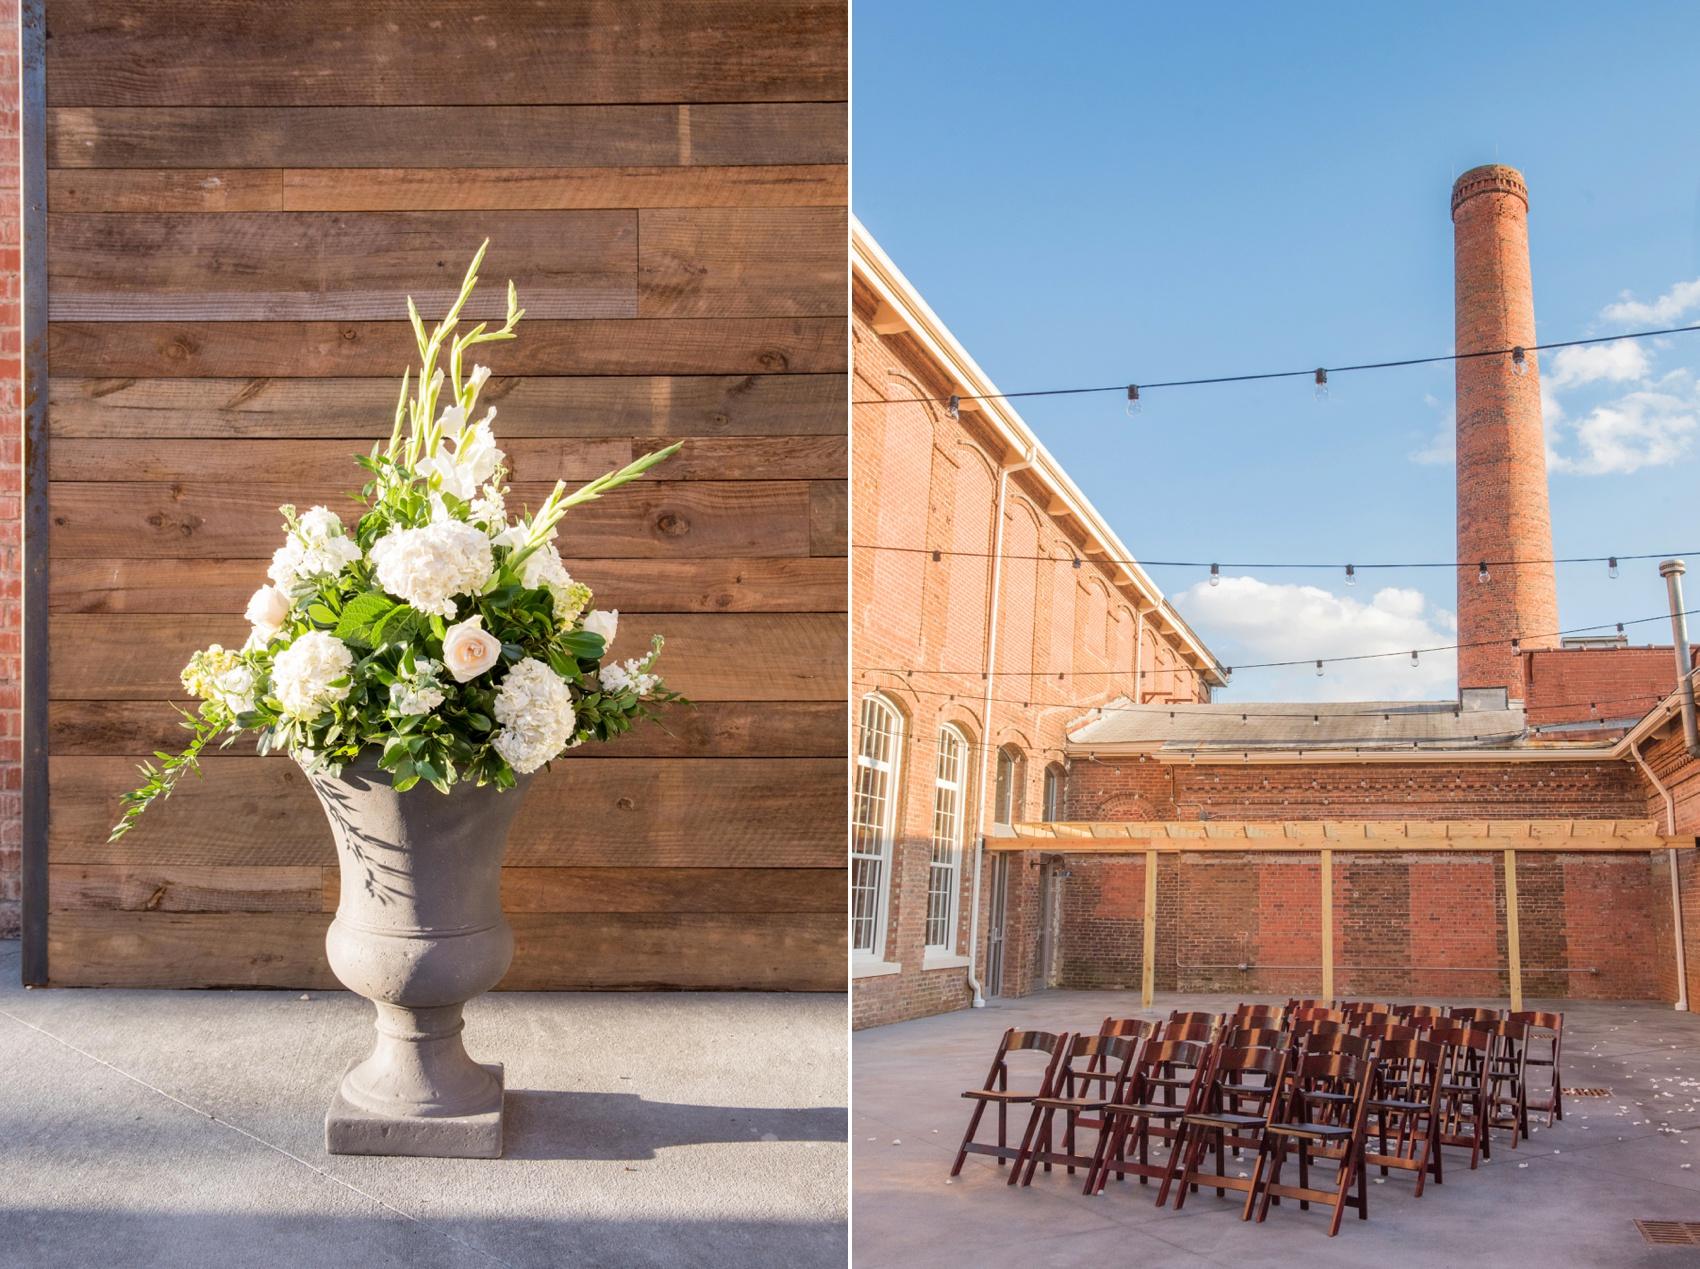 The Cloth Mill North Carolina wedding vendor showcase. Raleigh, Durham and Hillsborough vendors at a rustic, modern location.